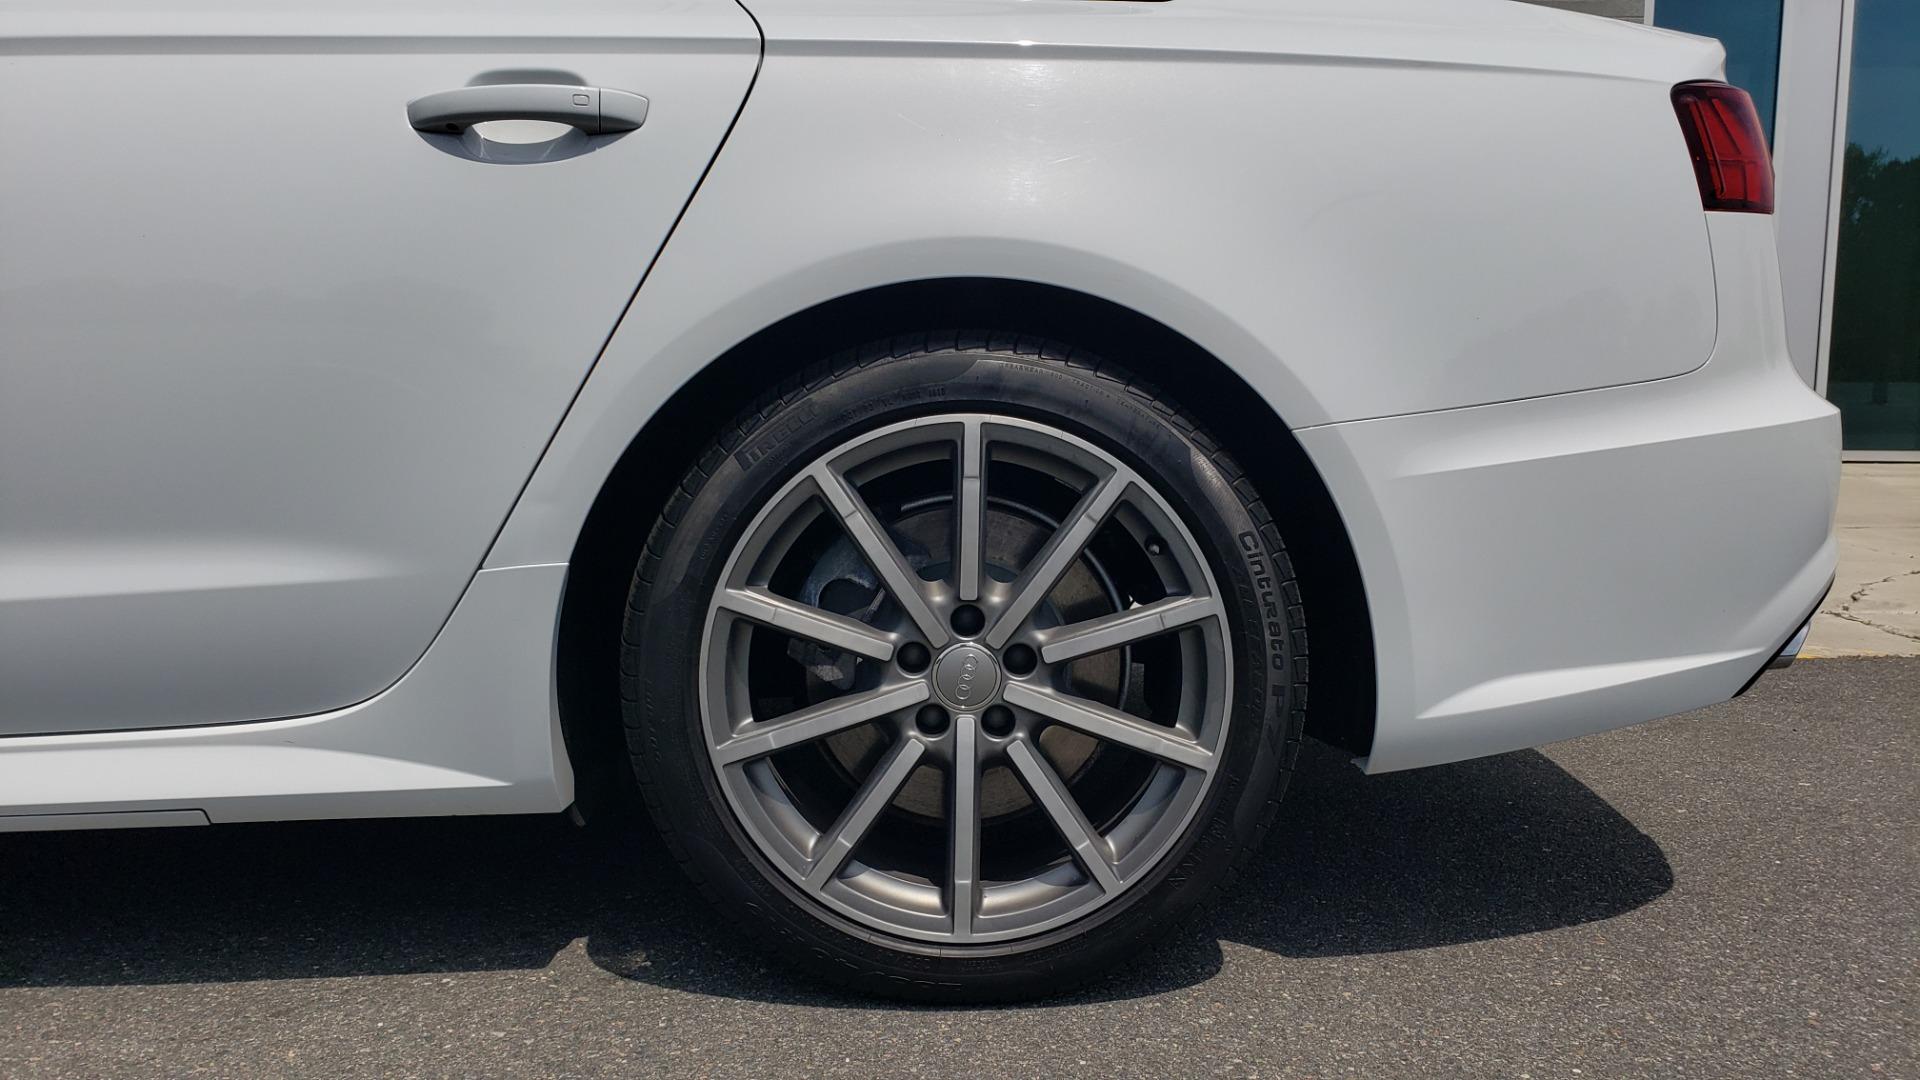 Used 2017 Audi A6 PRESTIGE SEDAN 3.0T / NAV / SUNROOF / BLACK OPTIC / CLD WTHR / REARVIEW for sale $30,797 at Formula Imports in Charlotte NC 28227 83